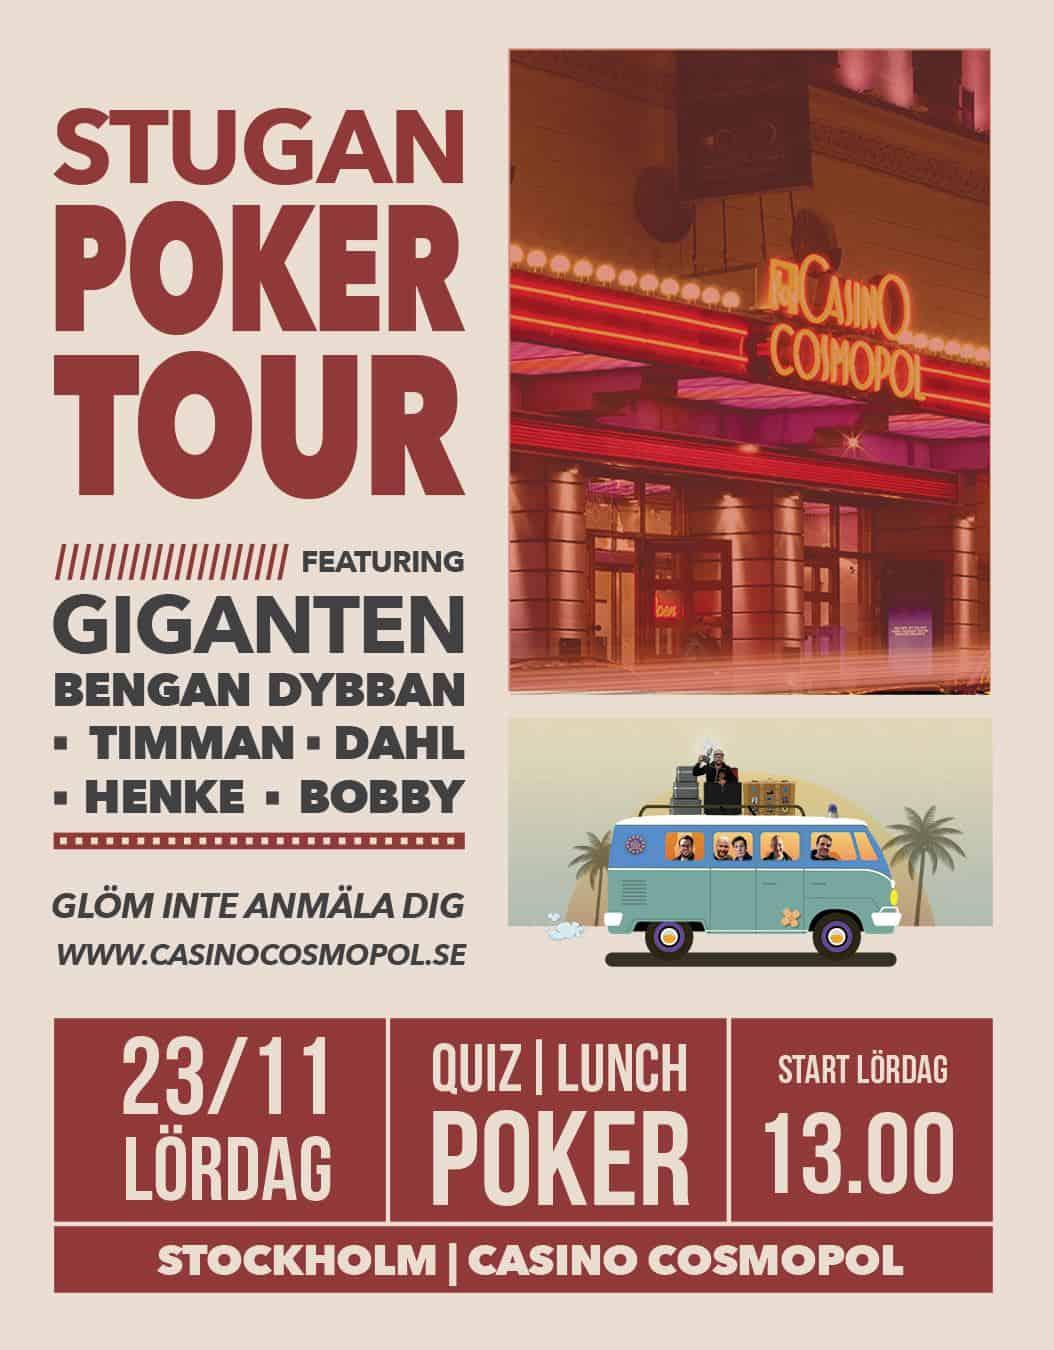 Stugans poker tour